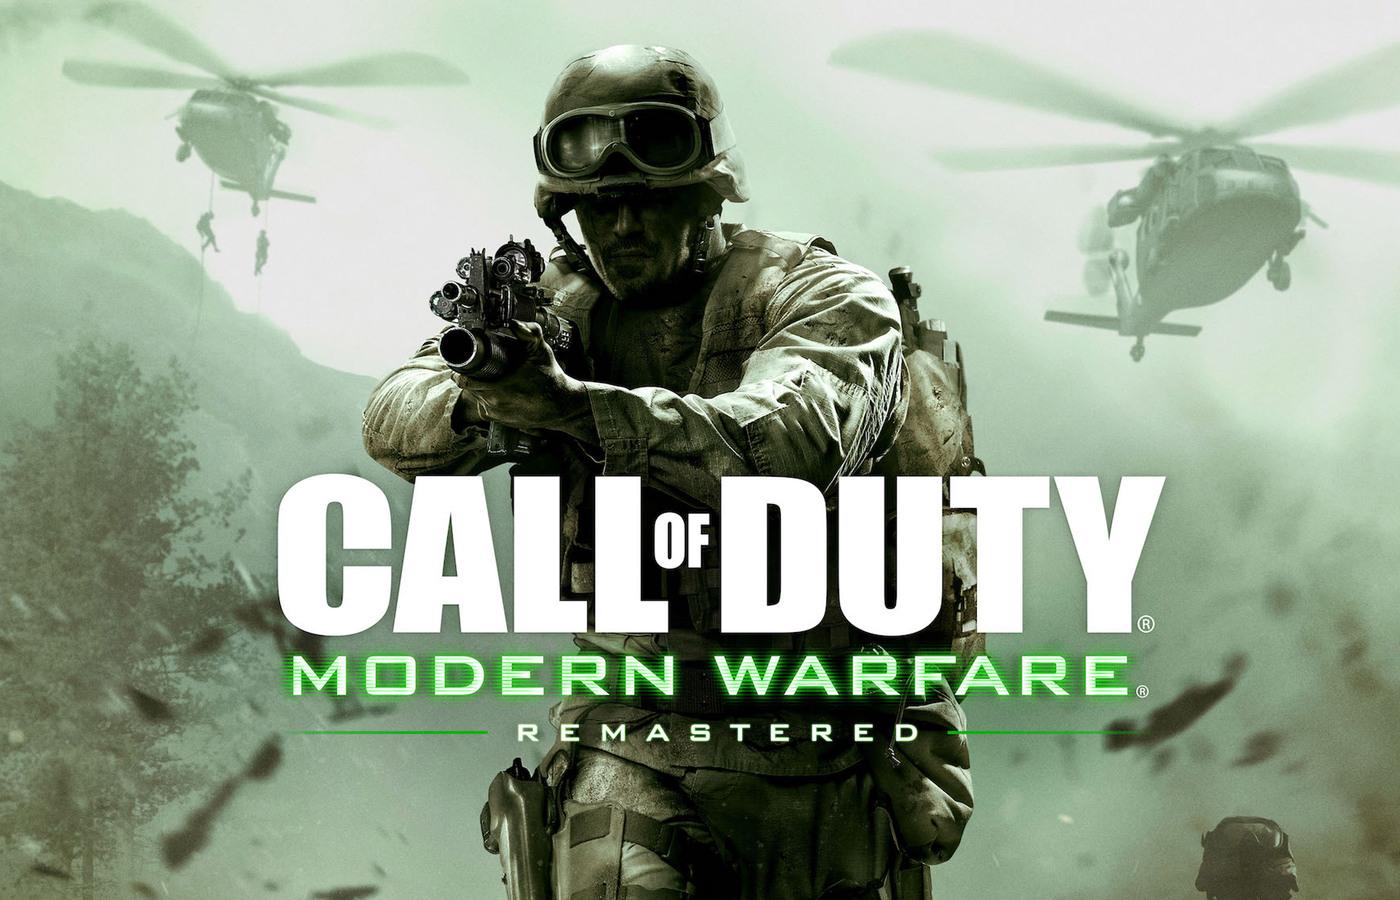 modern-warfare-remastered-call-of-duty-wide.jpg